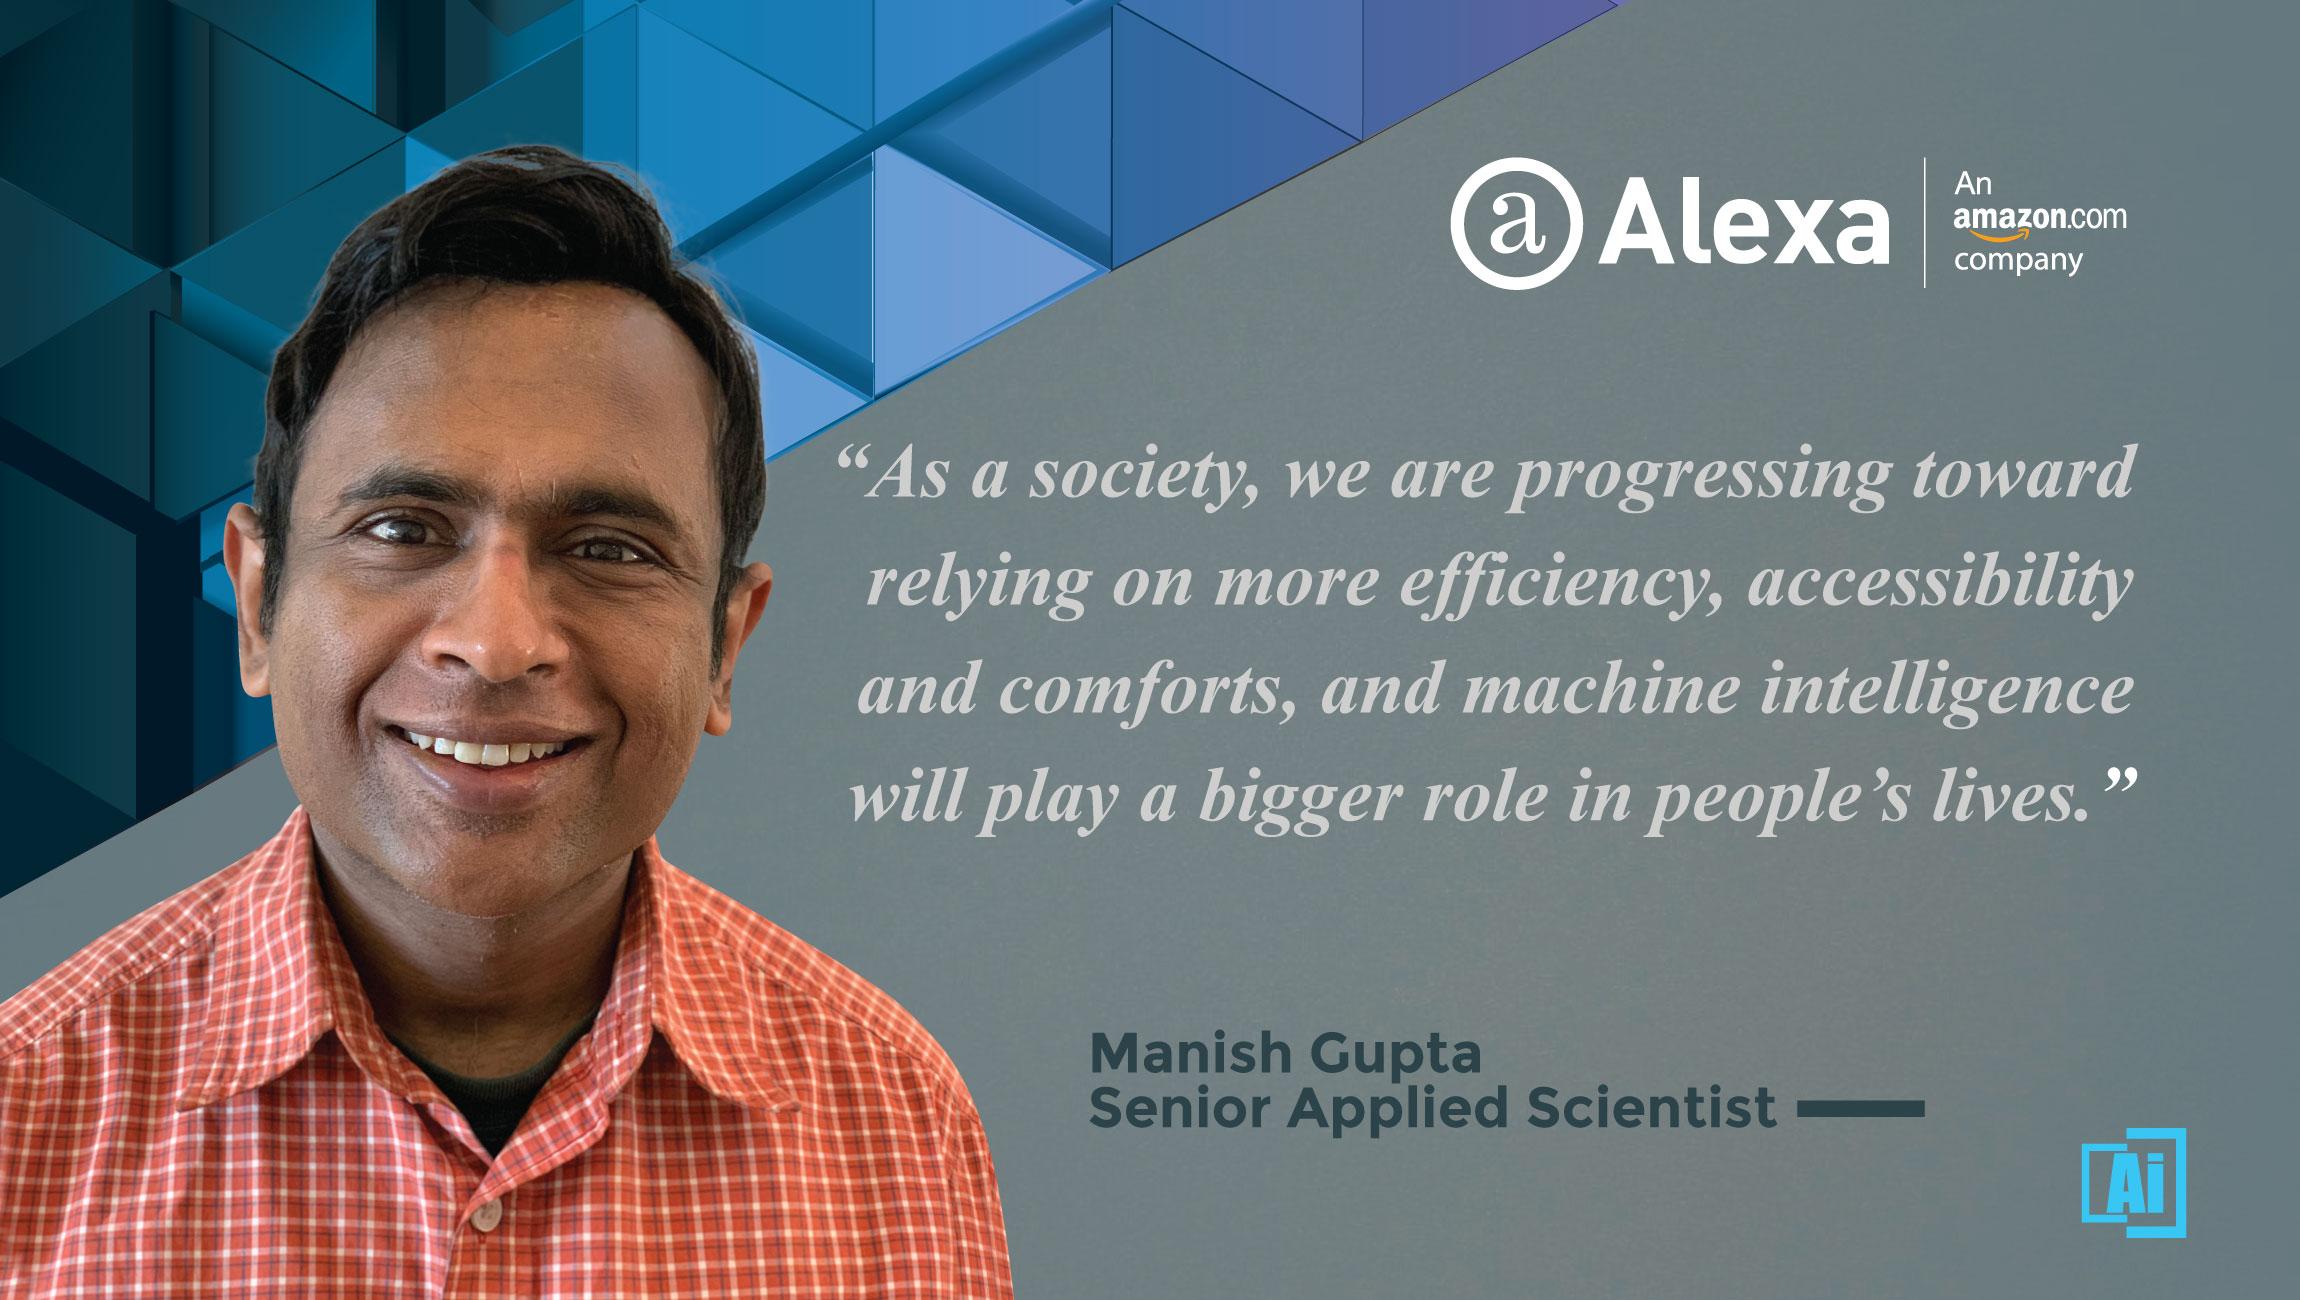 AiThority Interview with Manish Gupta, Senior Applied Scientist at Alexa.com